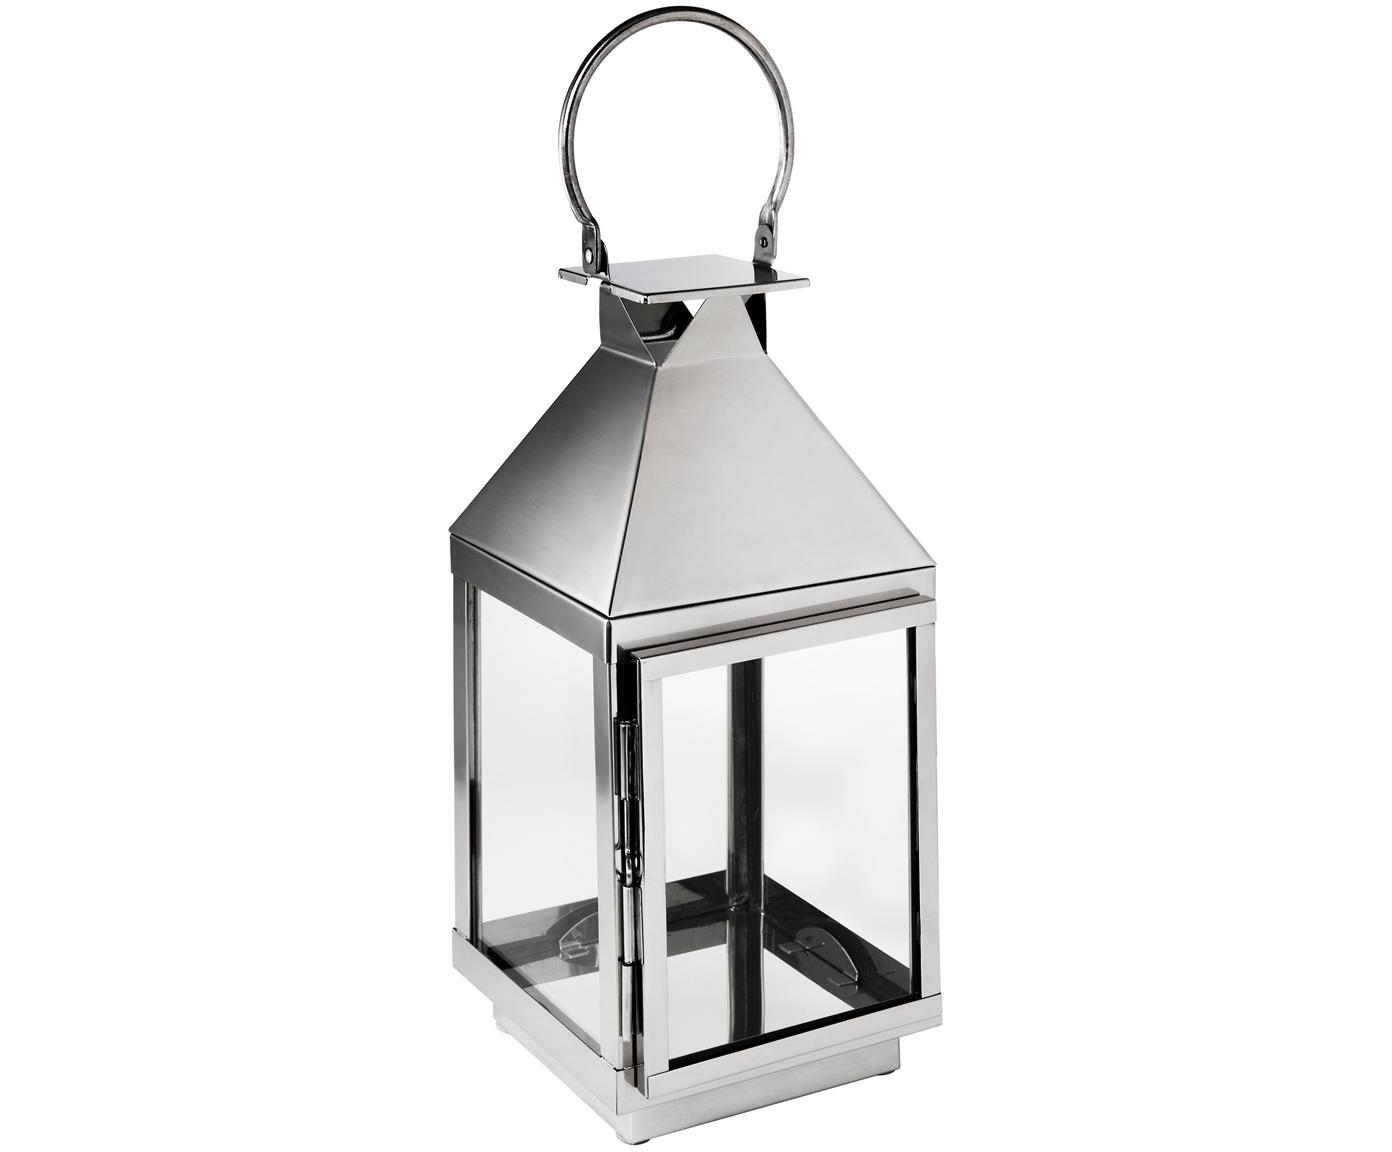 Laterne Grace, Hochglanzpolierter Edelstahl, Glas, Edelstahl, H 38 cm